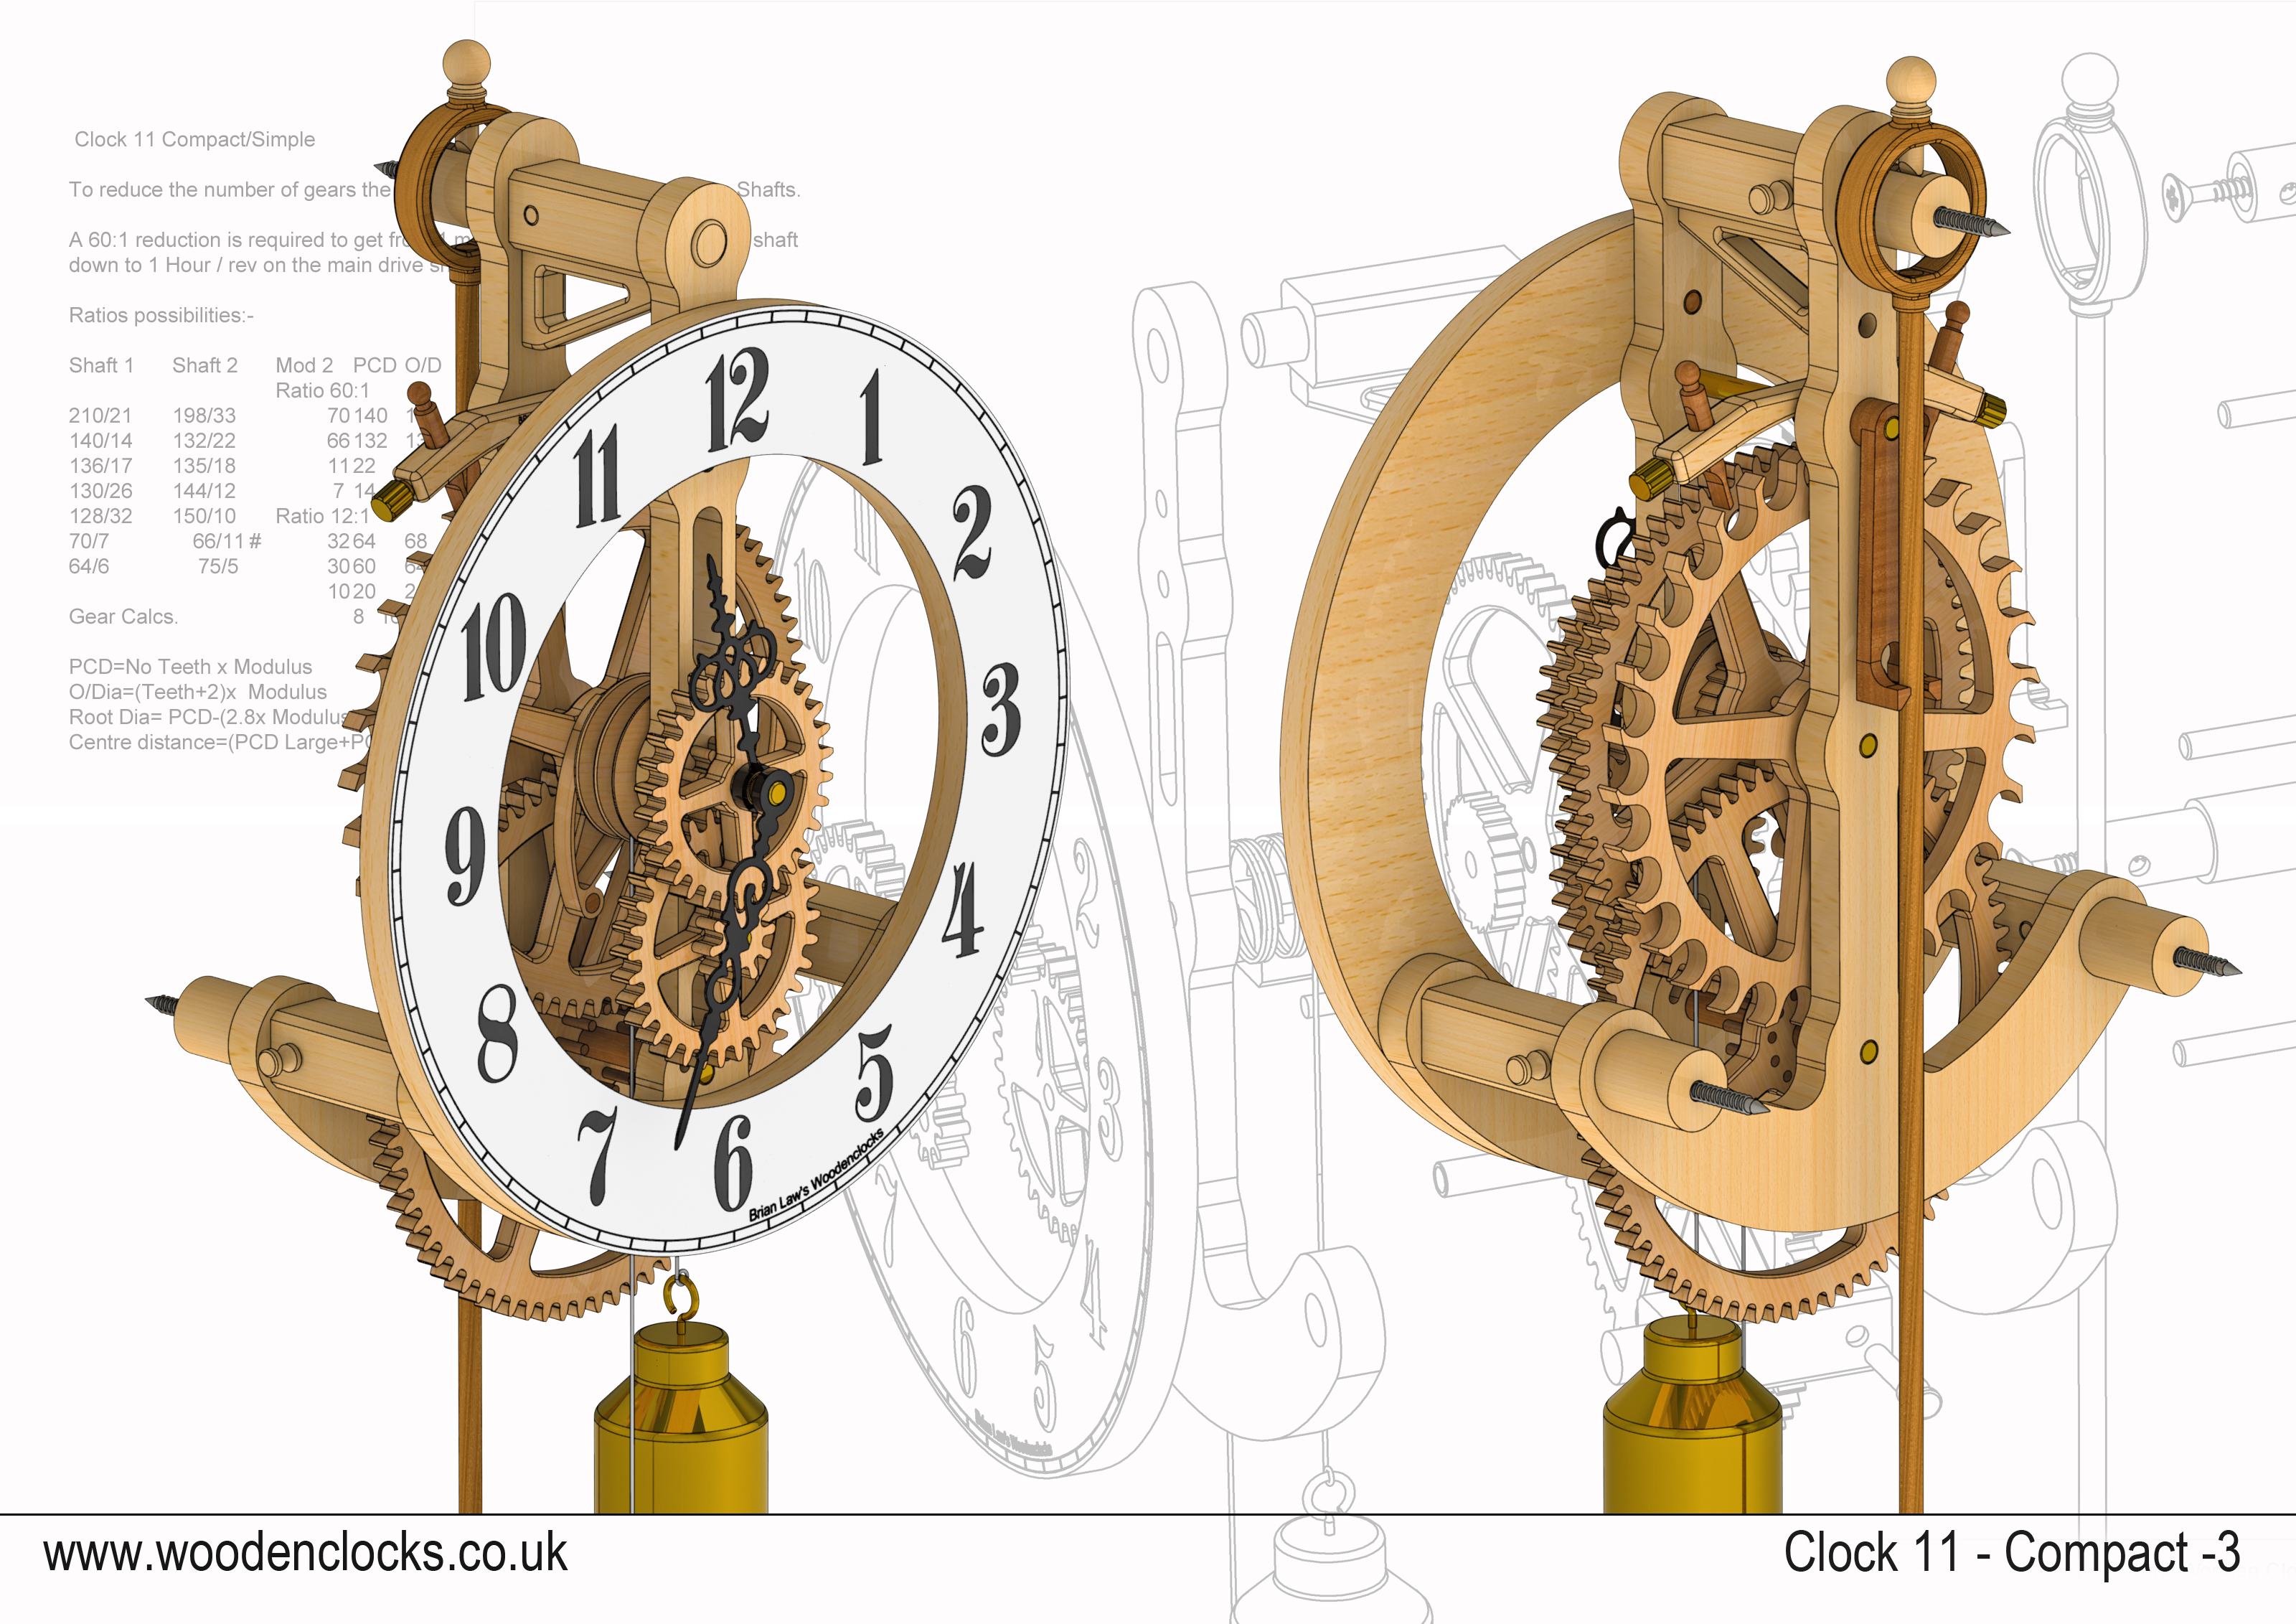 3200x2263 Clock11